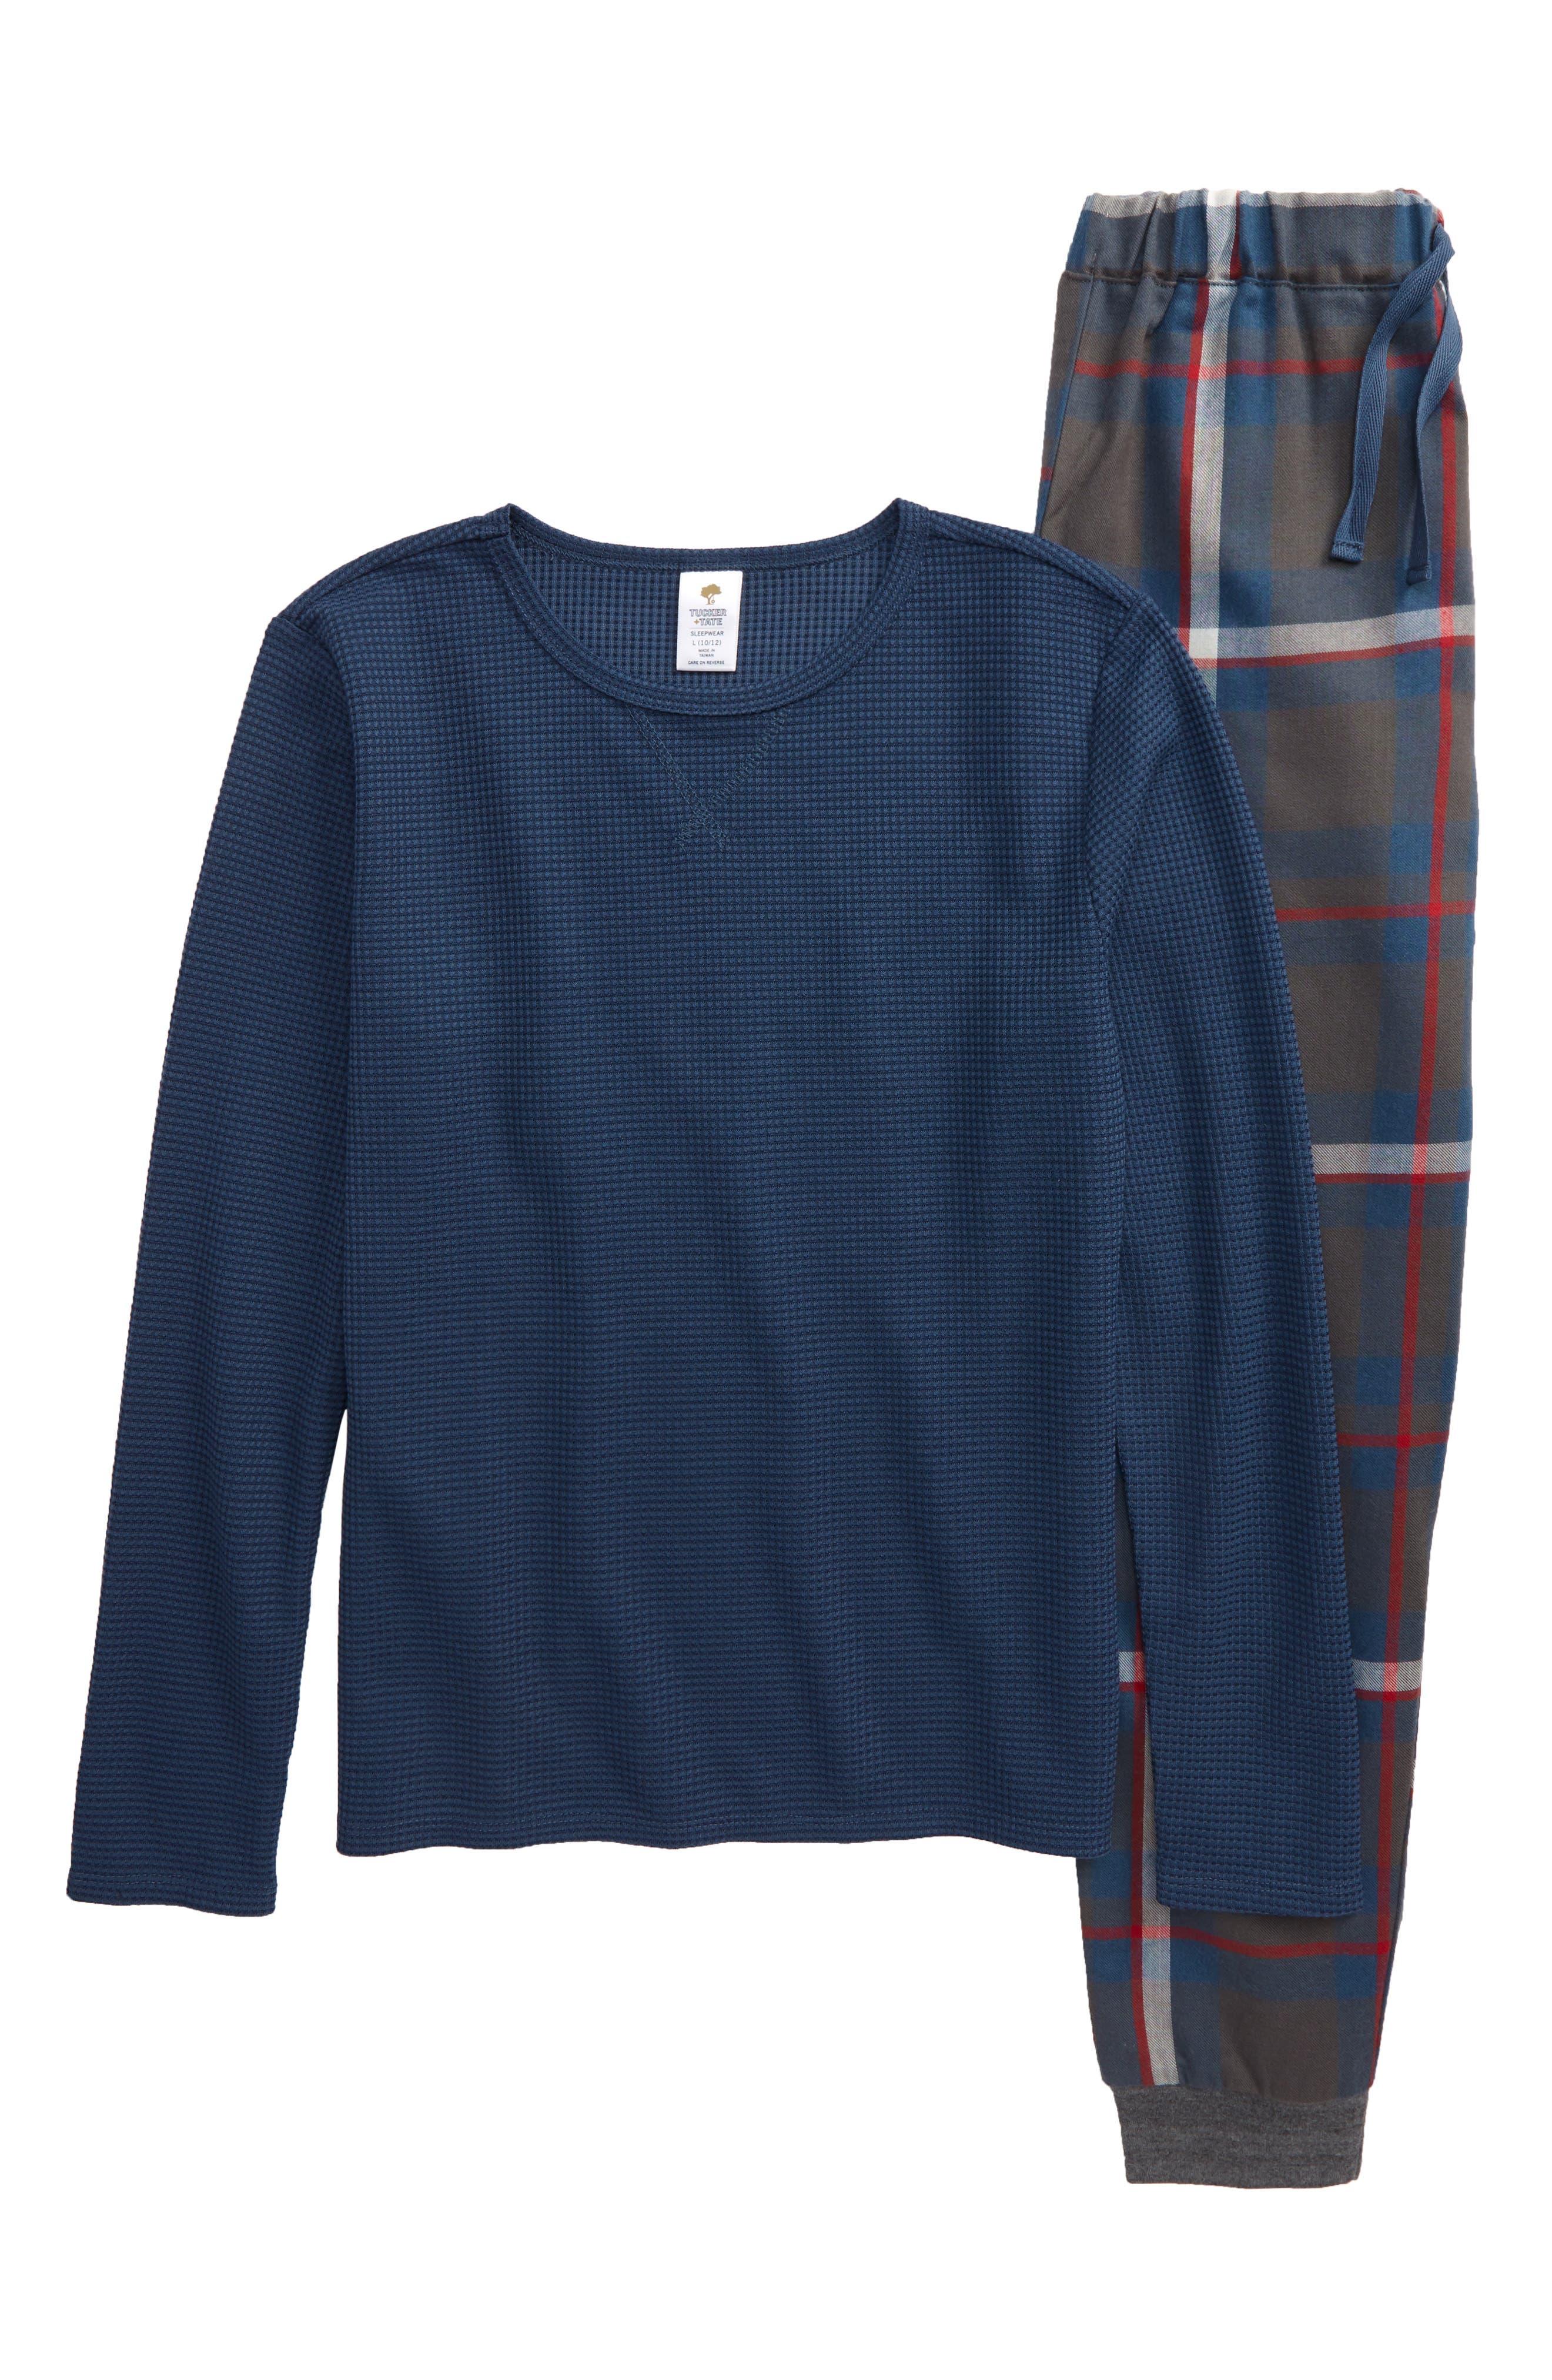 Boys Tucker  Tate TwoPiece Jogger Pajamas Size S (78)  Blue